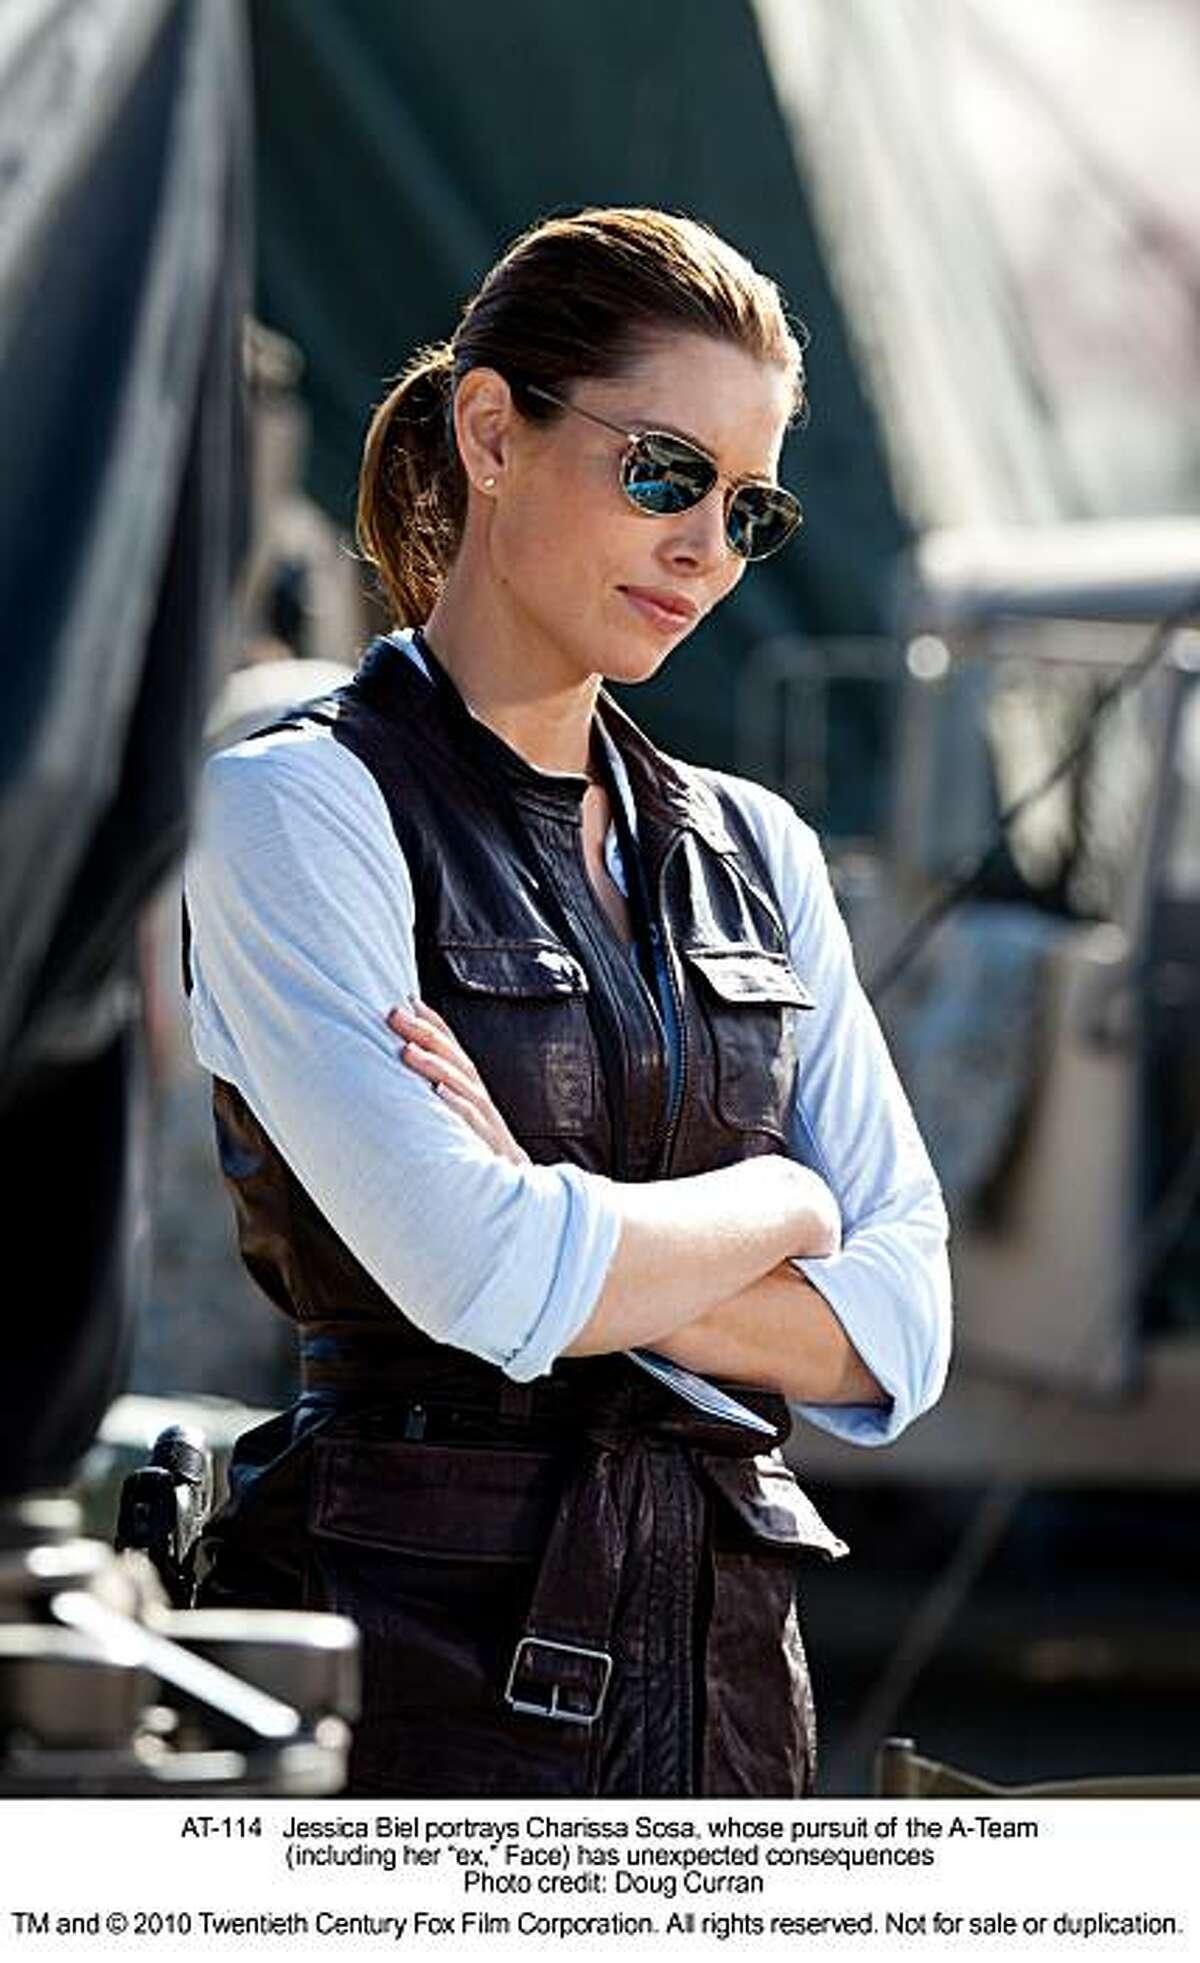 Jessica Biel portrays Charissa Sosa, whose pursuit of the A-Team (including her ?'ex,?